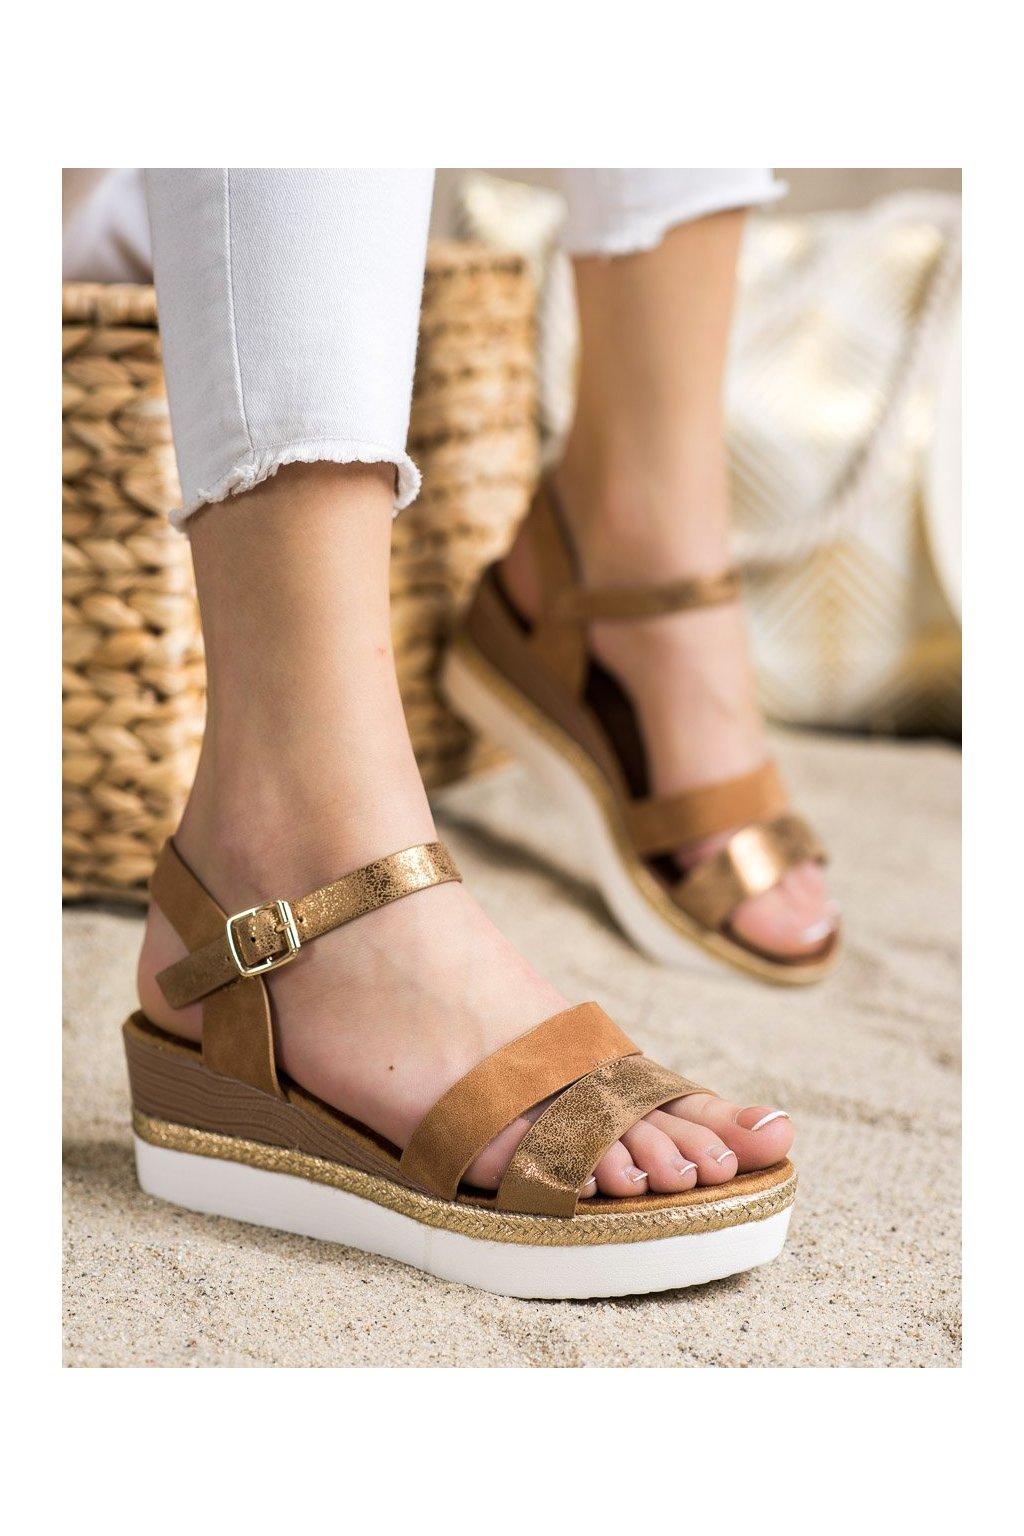 Hnedé sandále Shelovet kod W980C